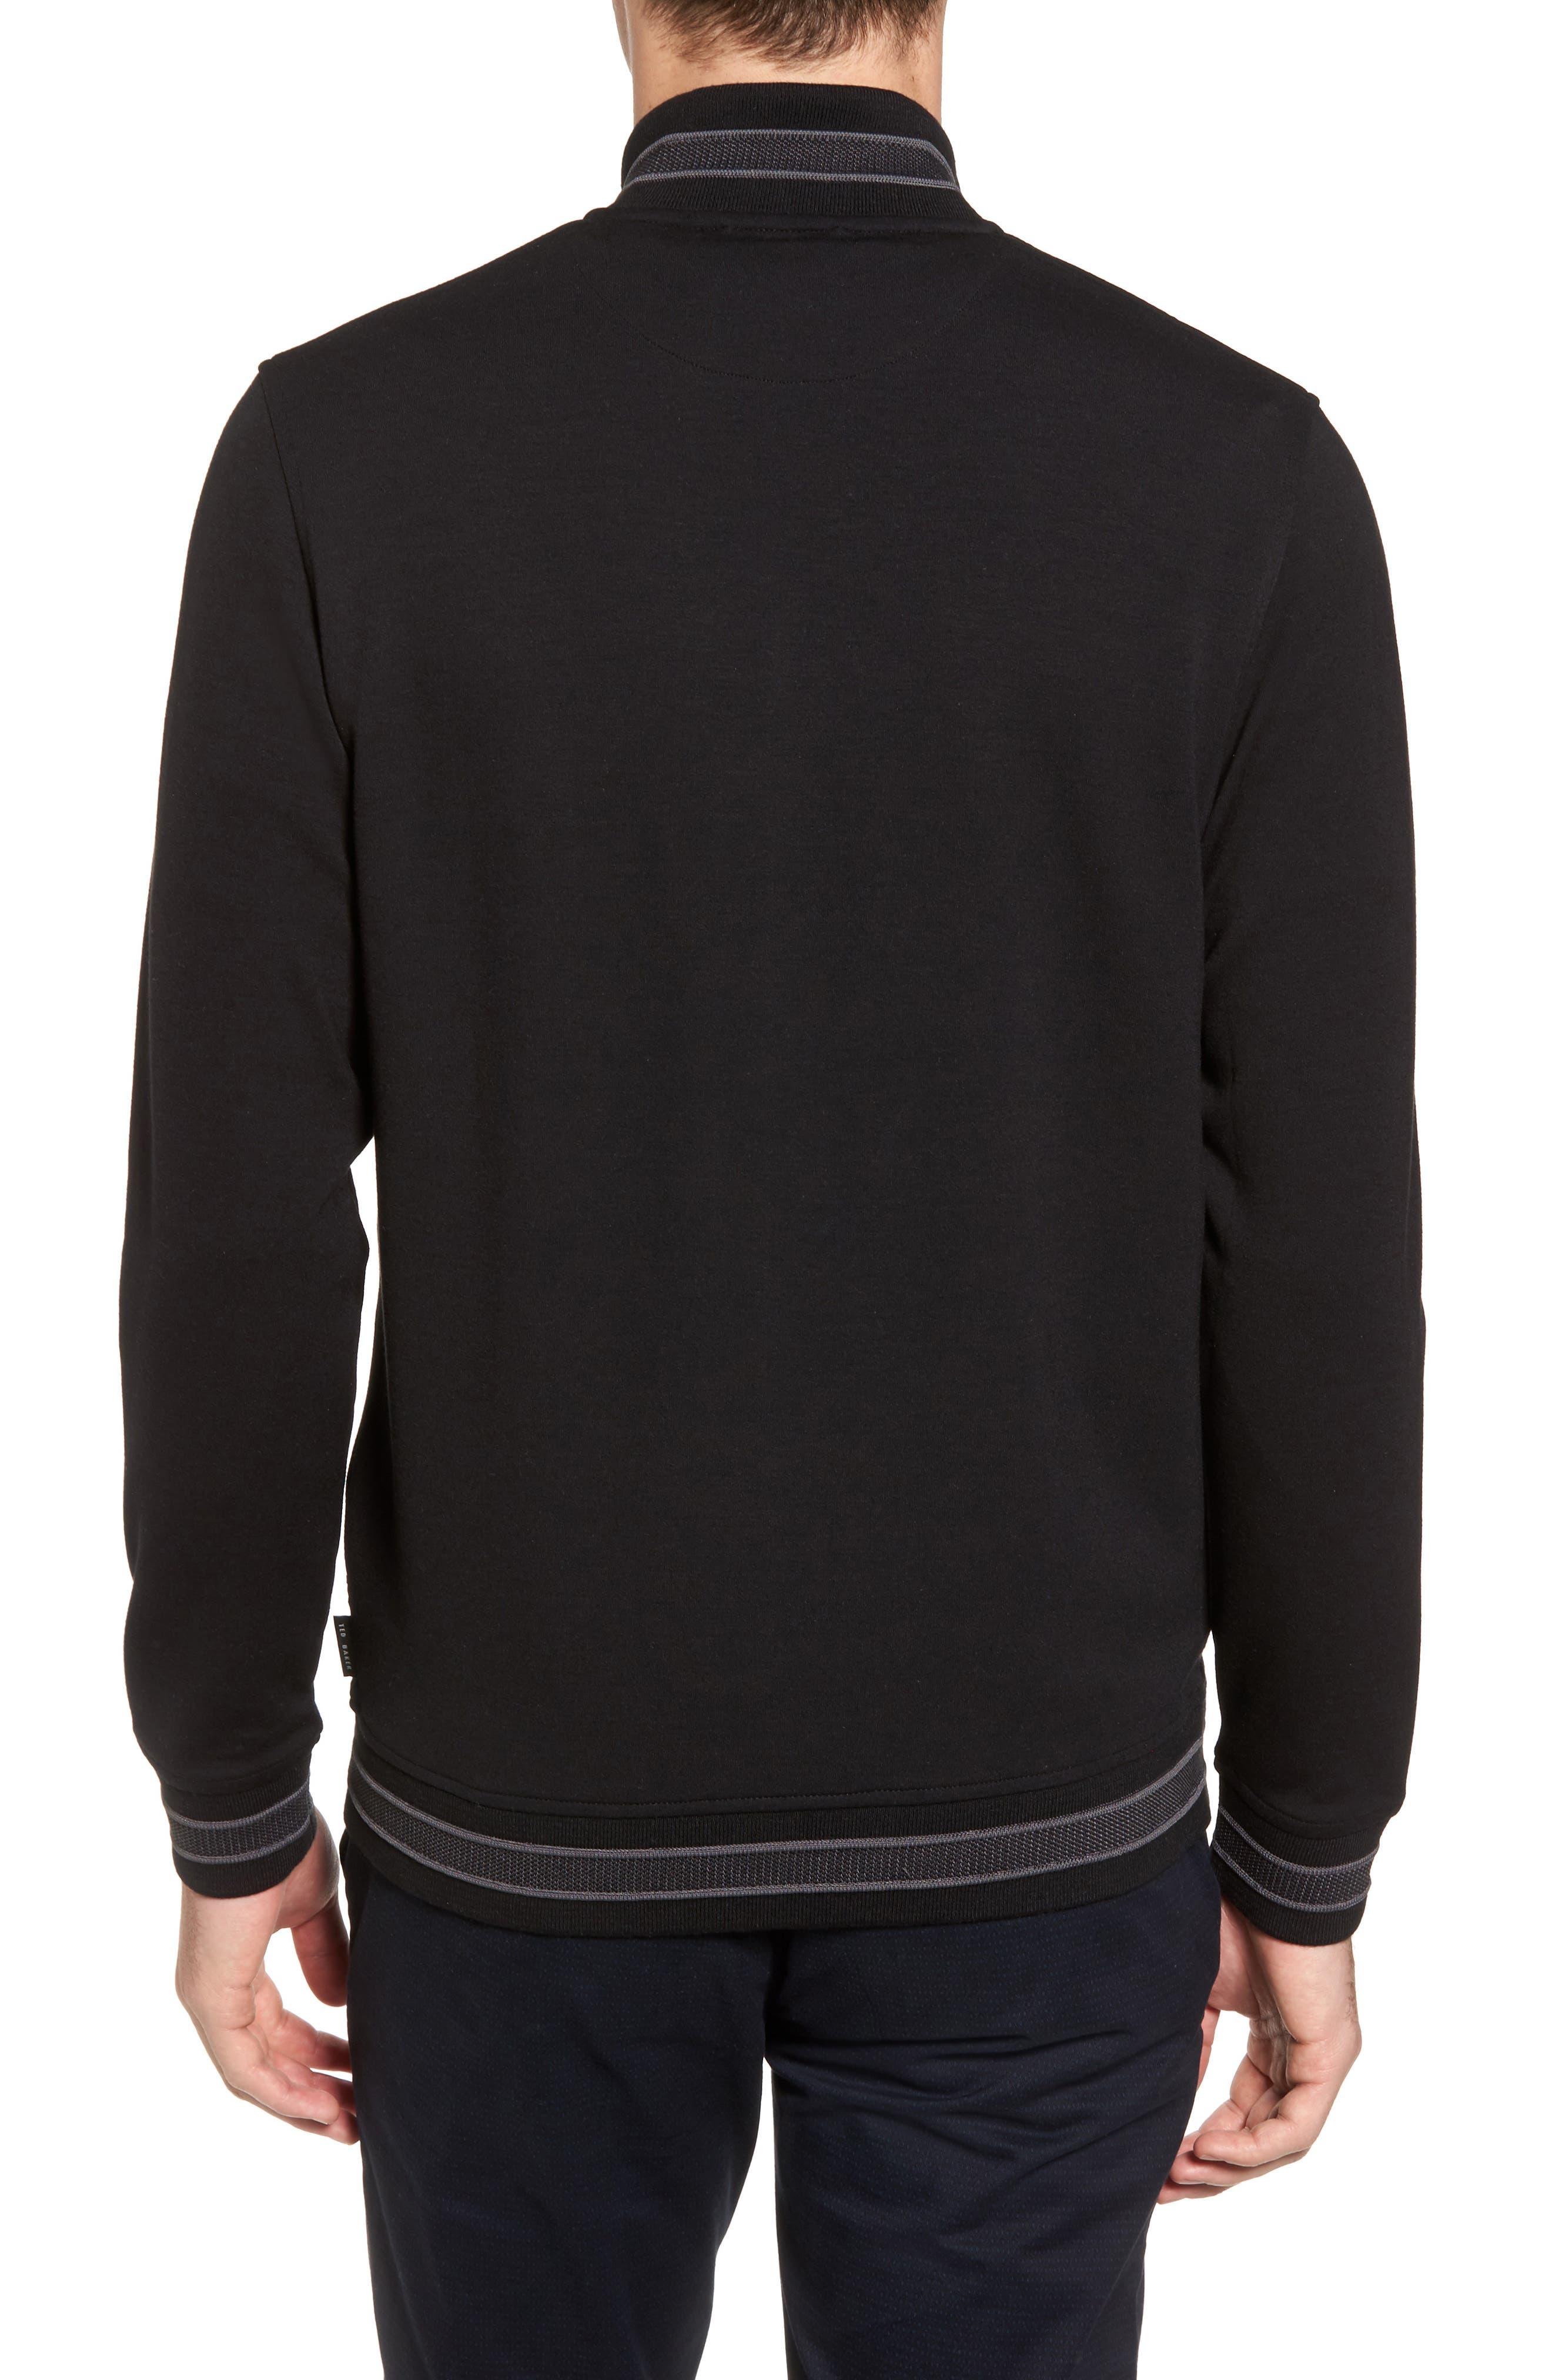 Collie Jersey Zip Jacket,                             Alternate thumbnail 2, color,                             001